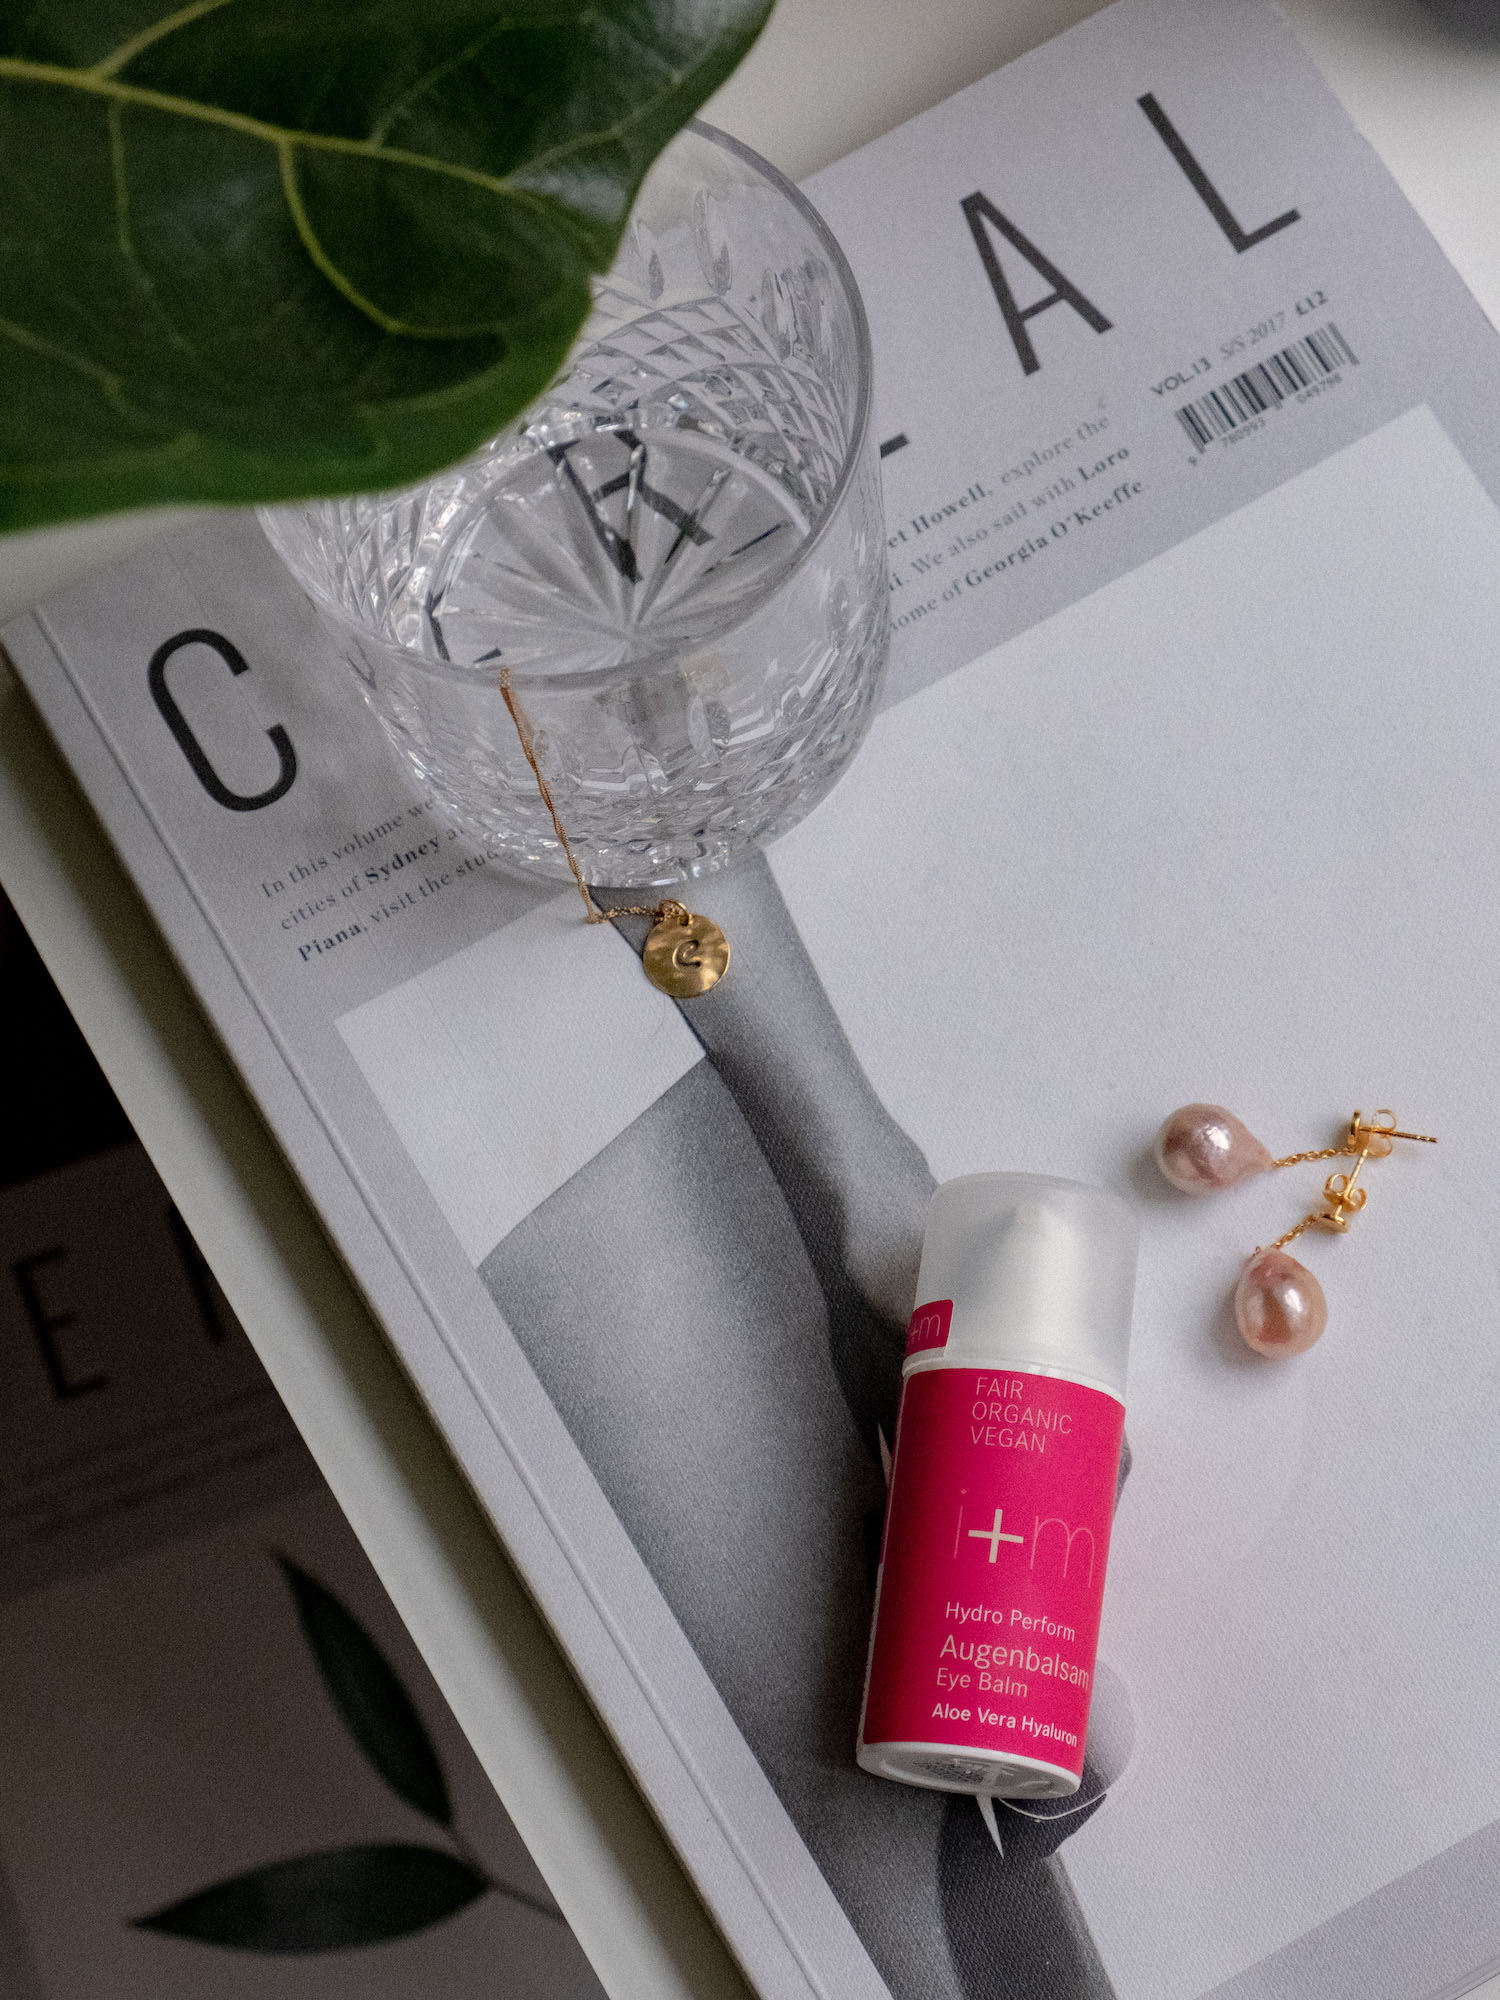 Beautyblog Bare Minds Hydro Perform Augenpflege